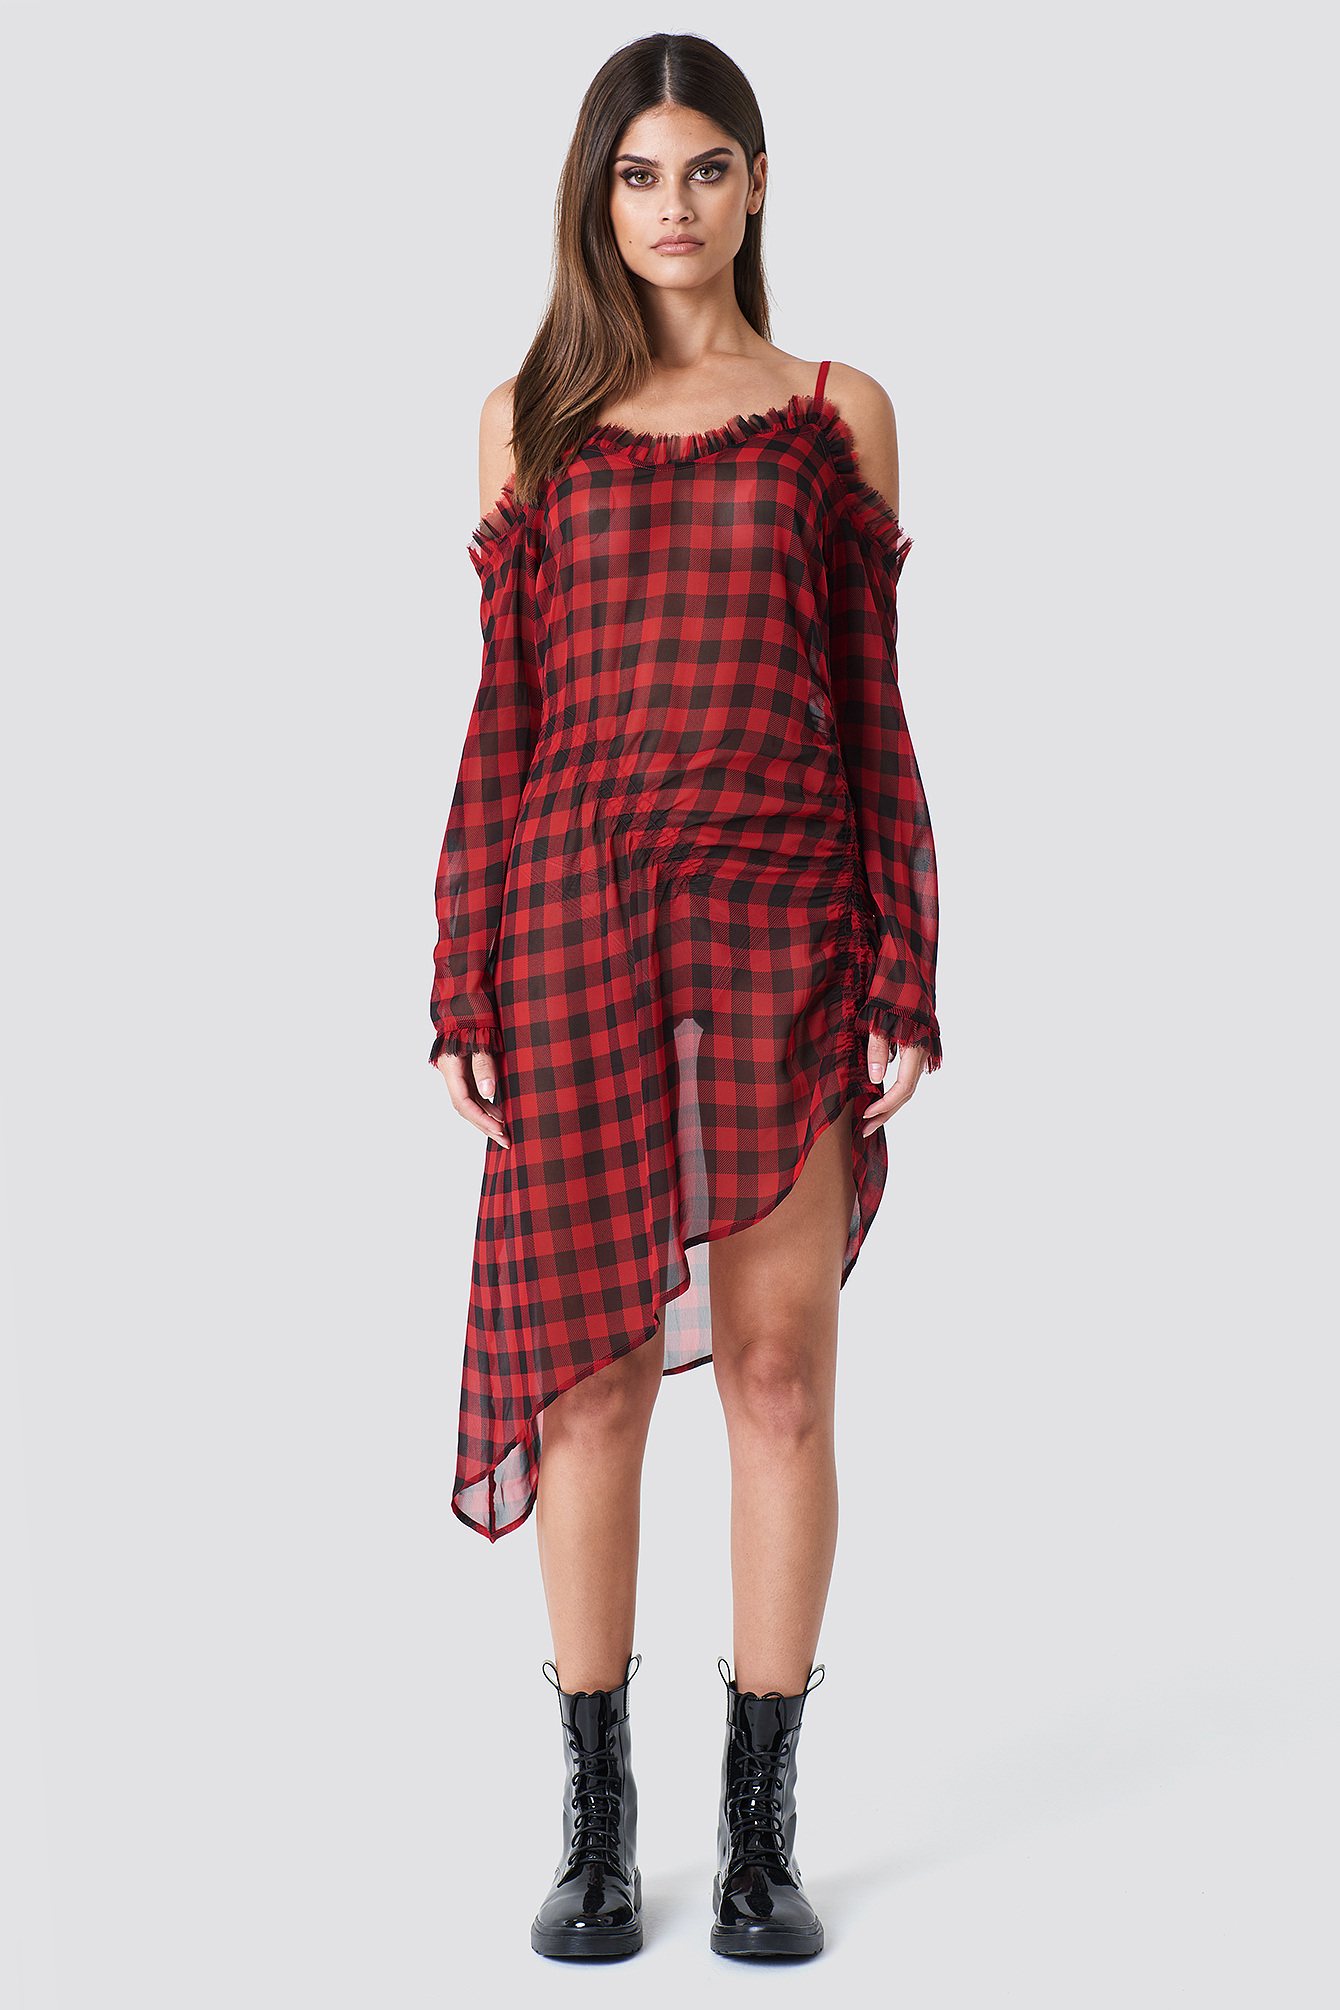 SAHARA RAY X NA-KD Checked Transparent Asymmetric Dress - Red